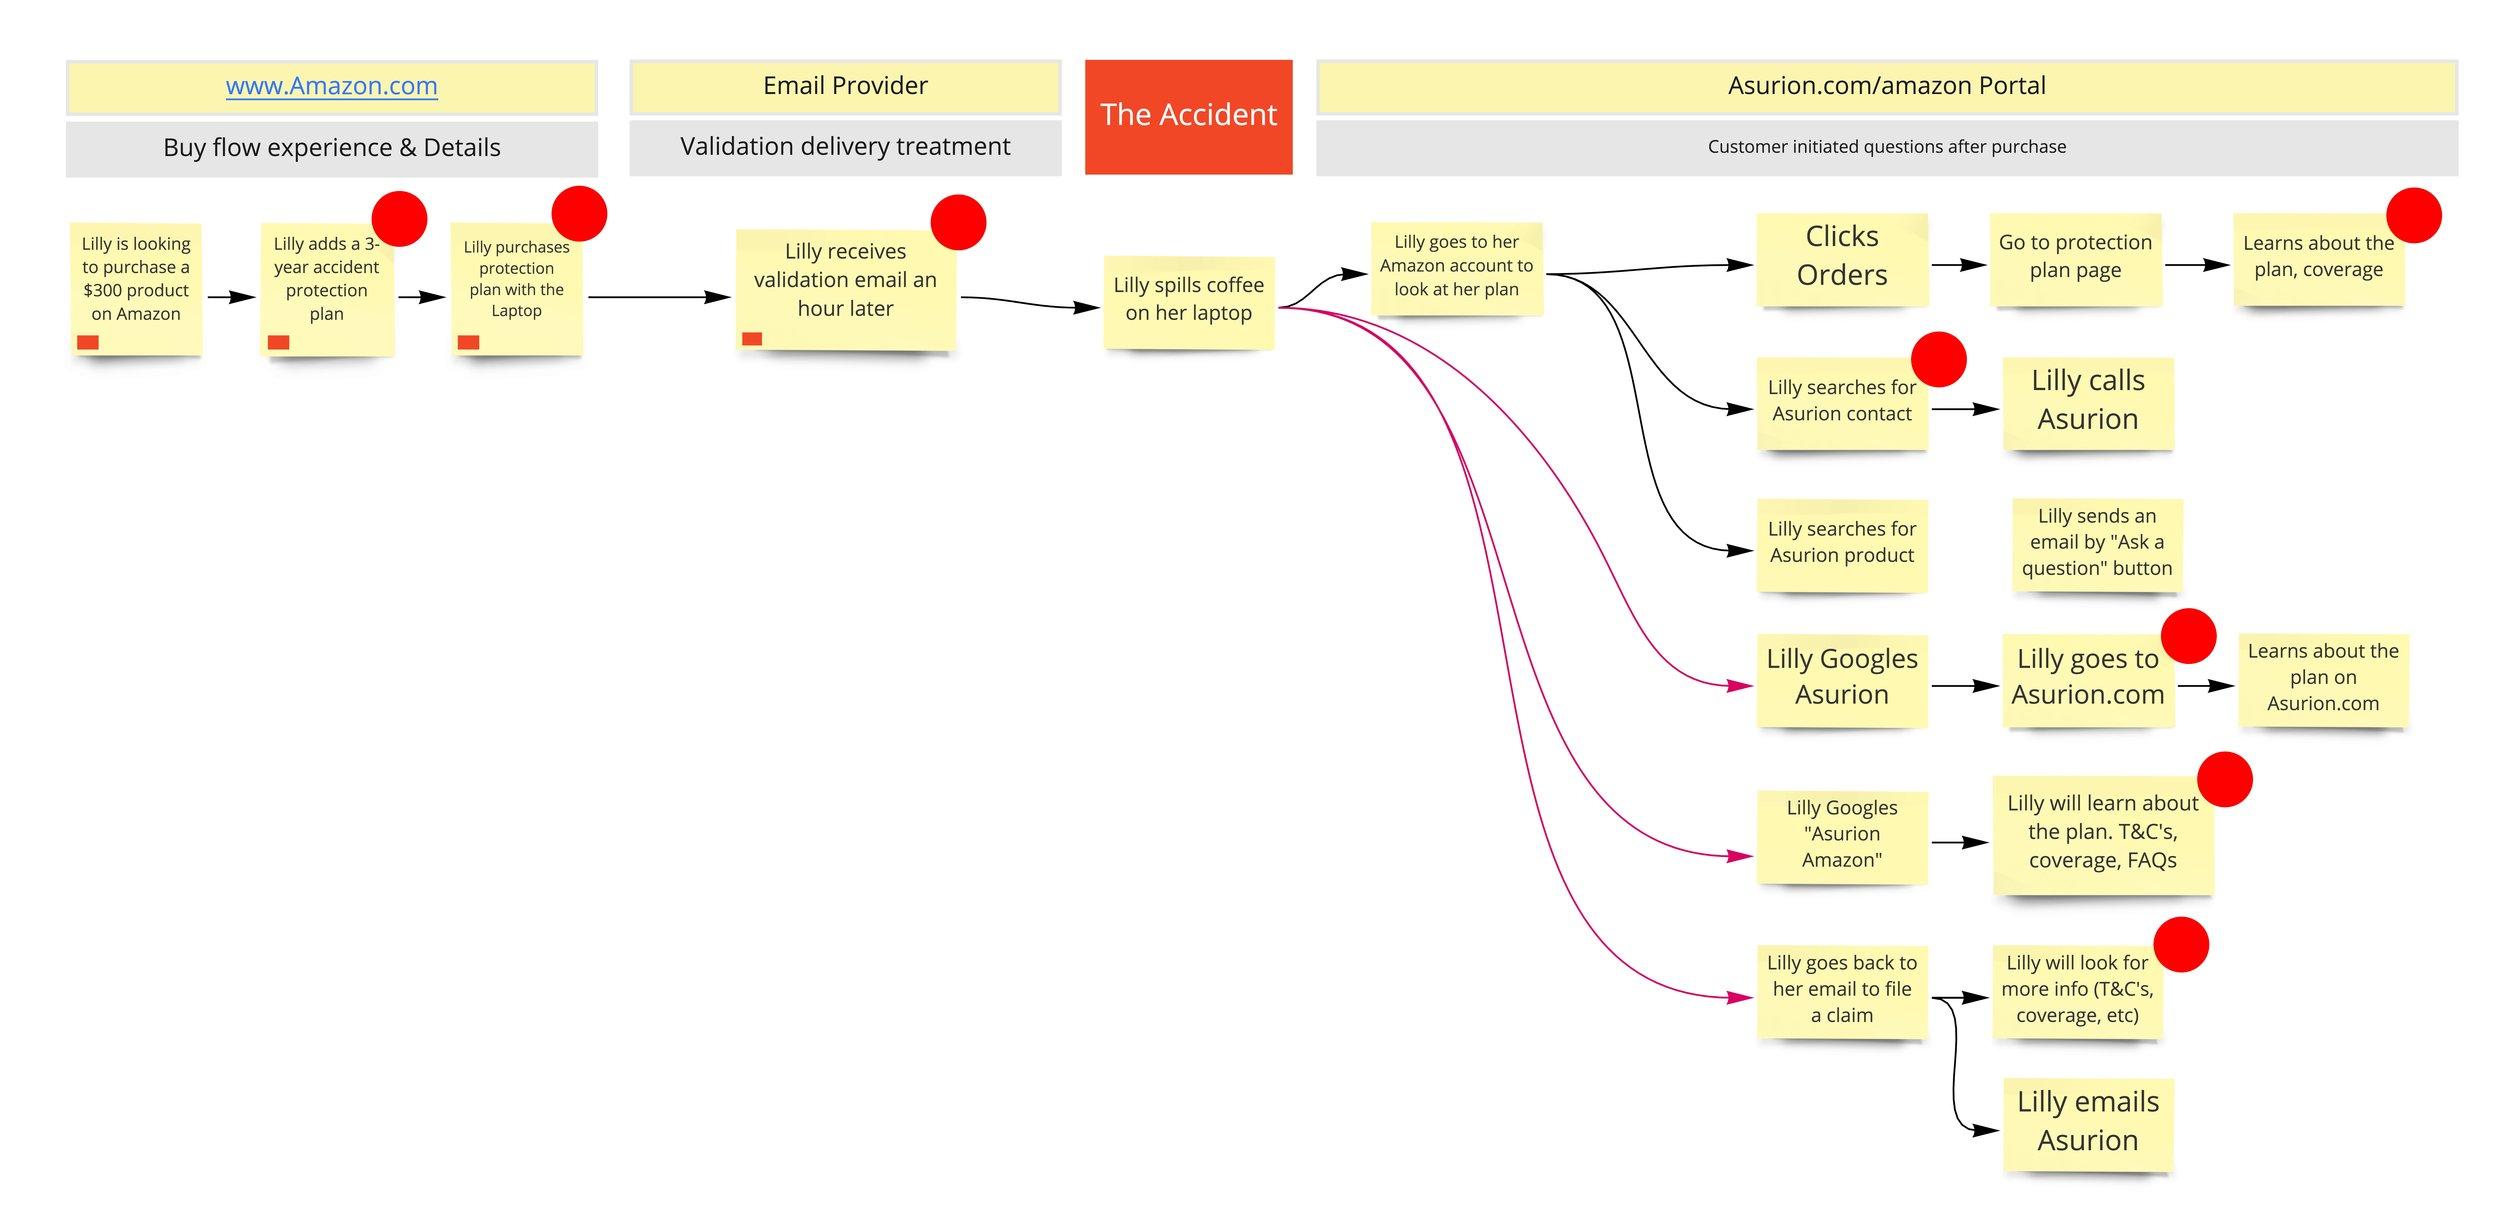 11 Star - Amazon Workshop - Copy of Current Amazon Experience Journey (1).jpg